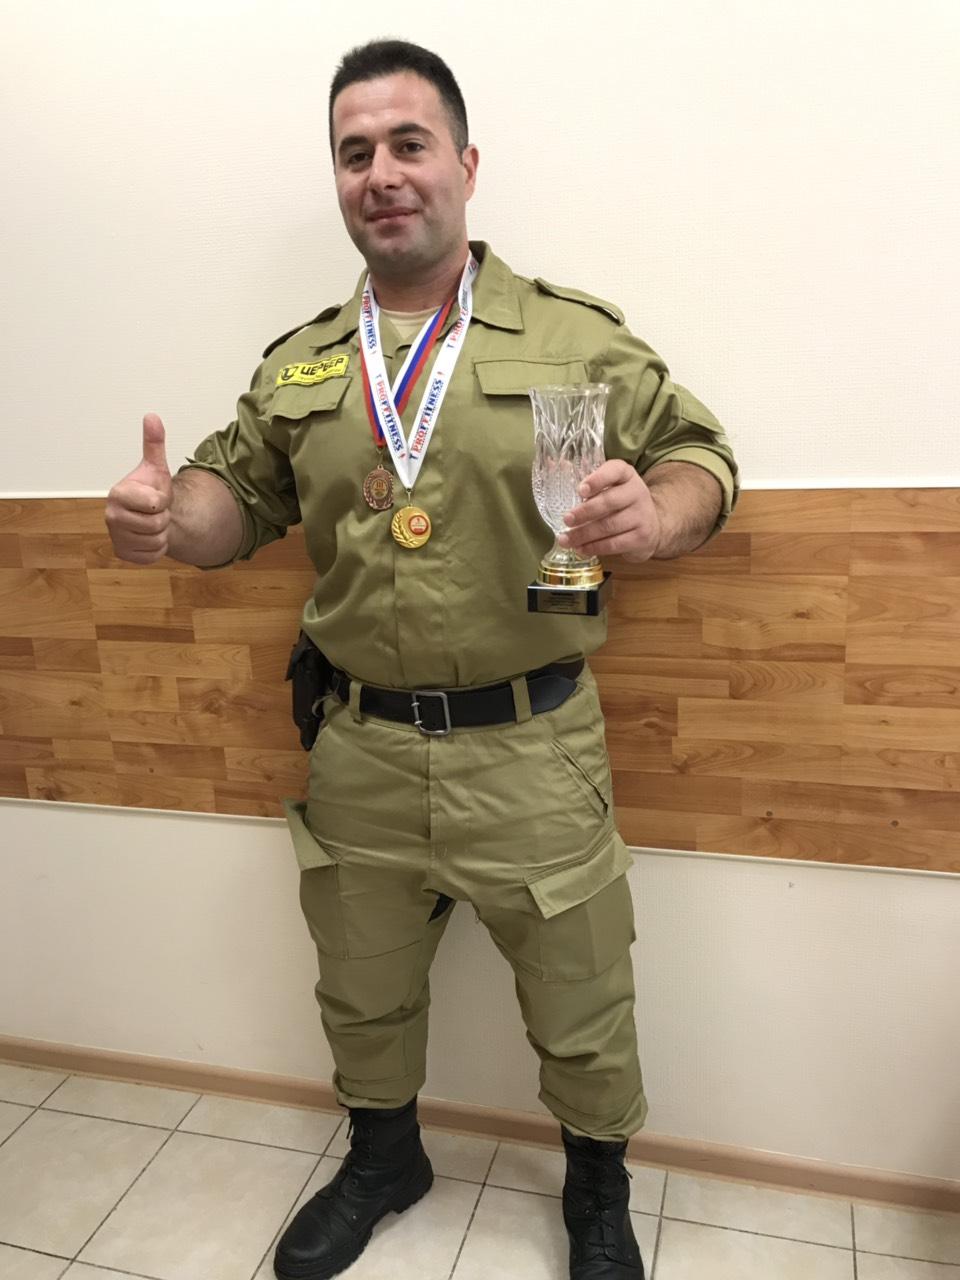 Сотрудник ГП Цербер - призёр Кубка по пауэрлифтингу